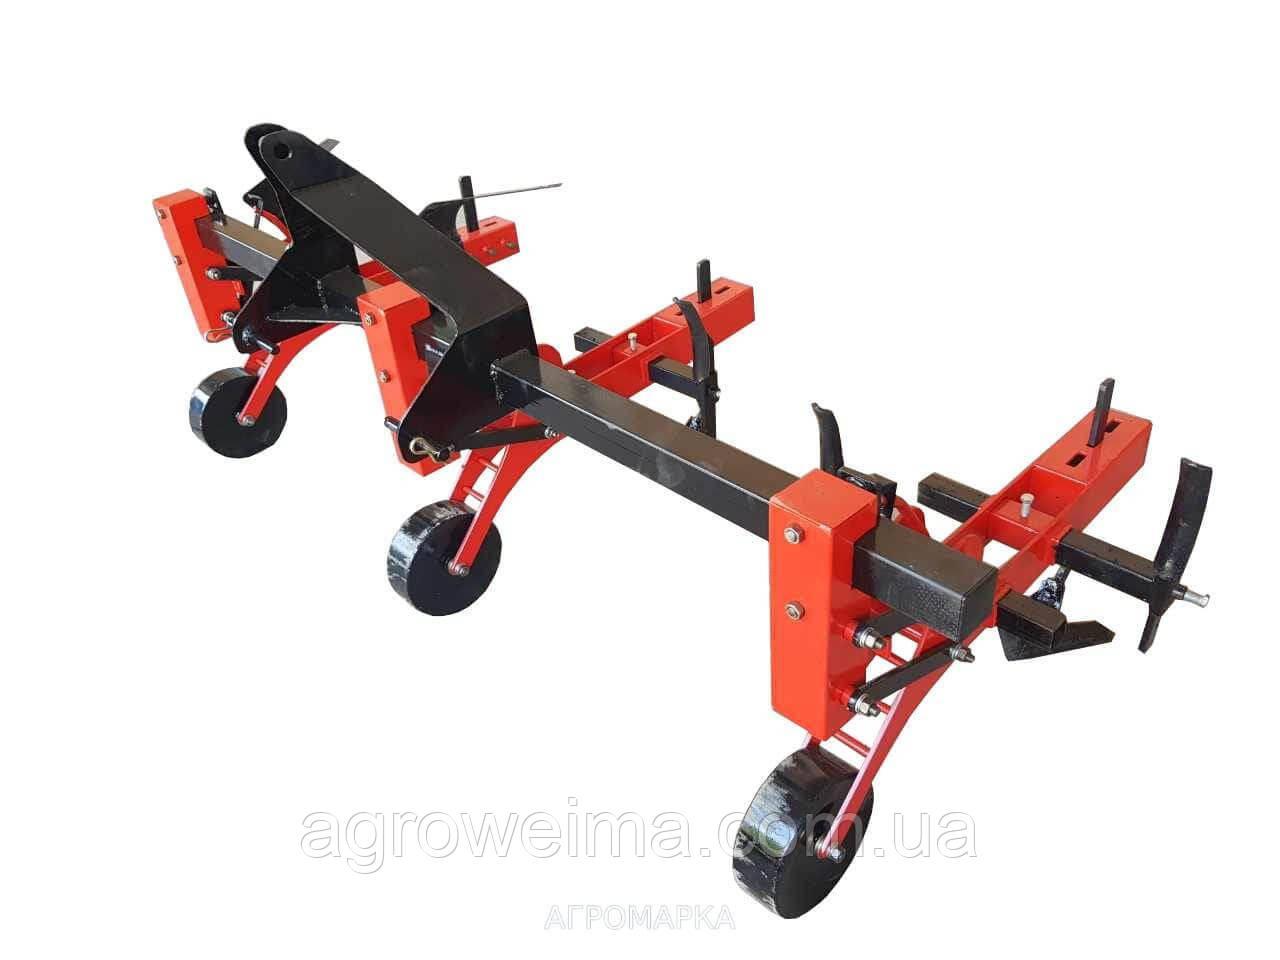 Культиватор КРН-3-1,7 (культиватор навесной для трактора, для обработки междурядий) комплектация: три секции,